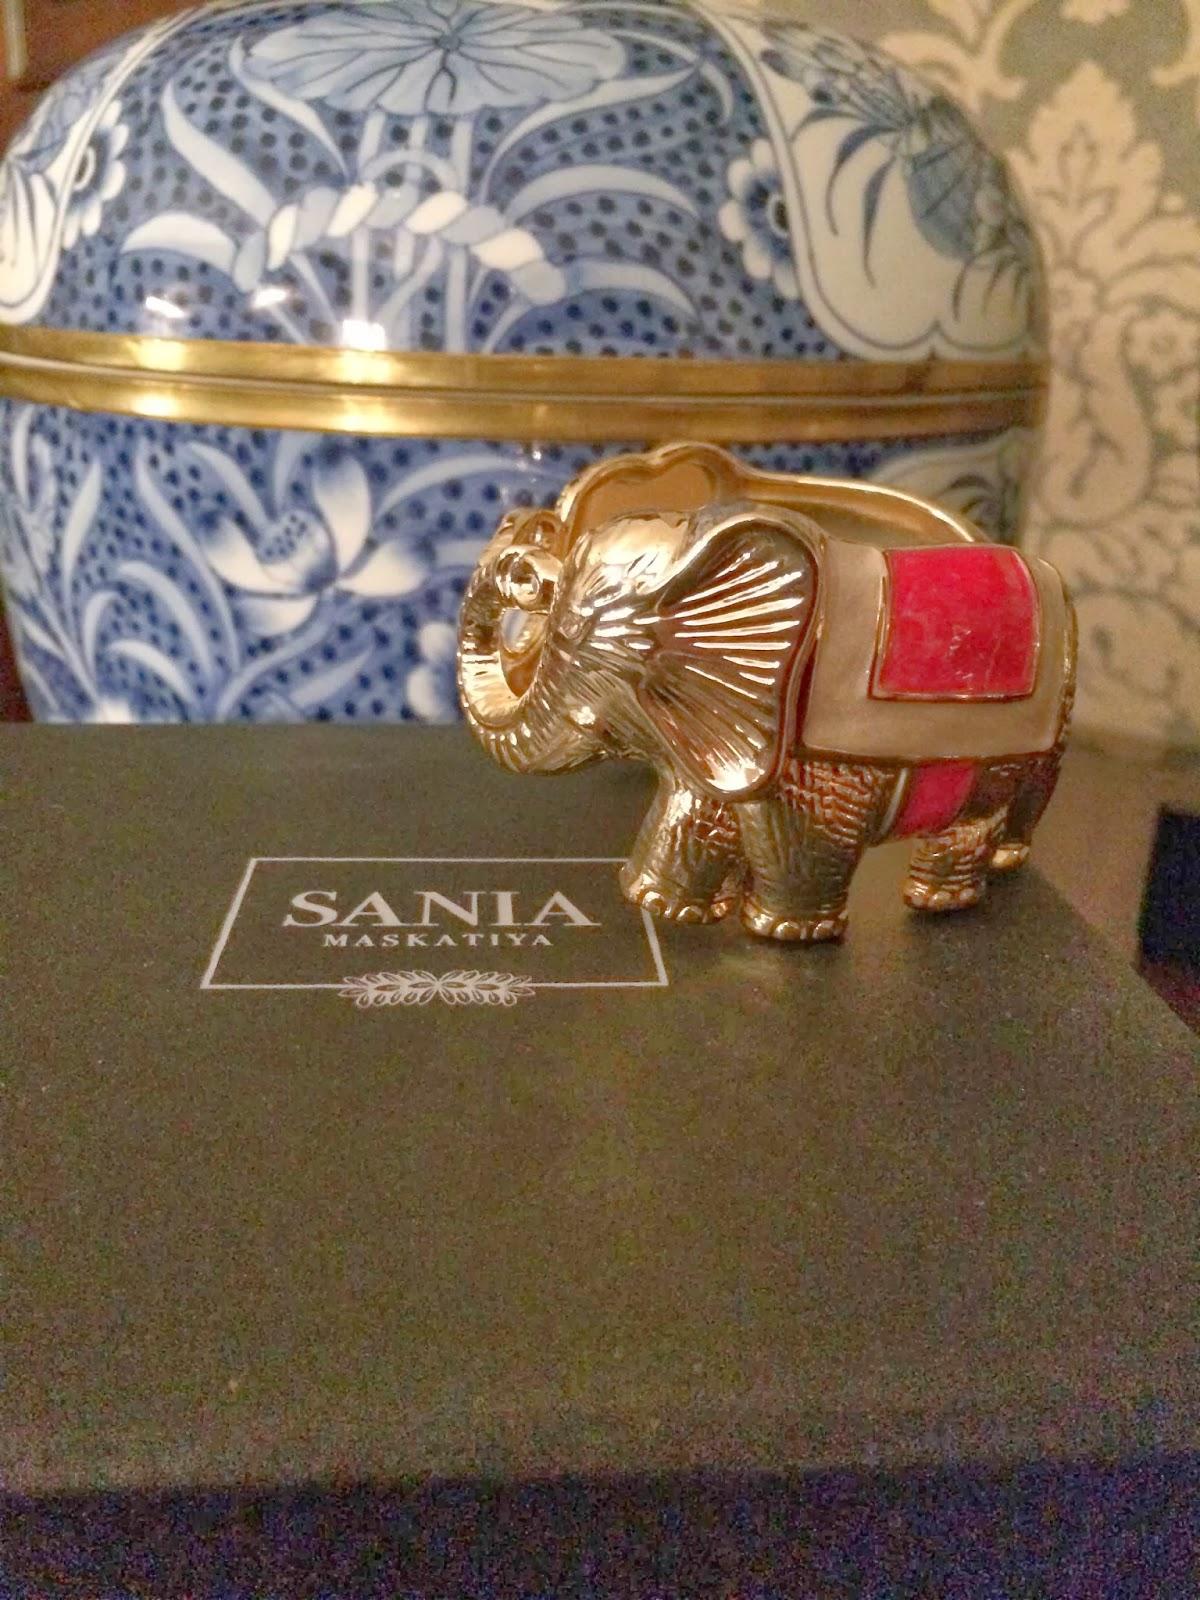 Giveaway - win a Sania Maskatiya designer bracelet